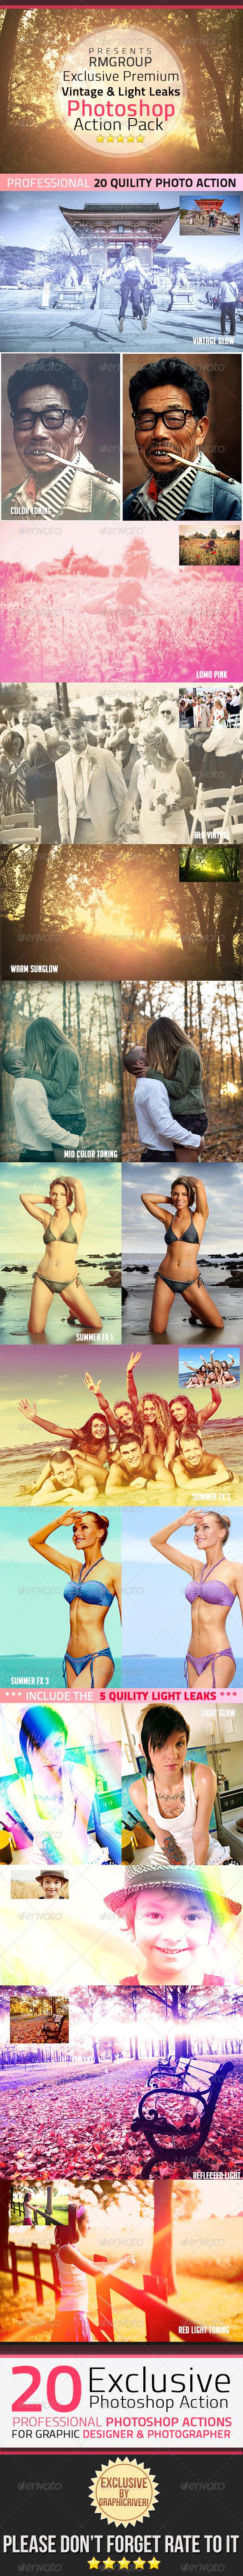 GraphicRiver 20Exclusive Vintage & Light Leaks Photoshop Action 5002244